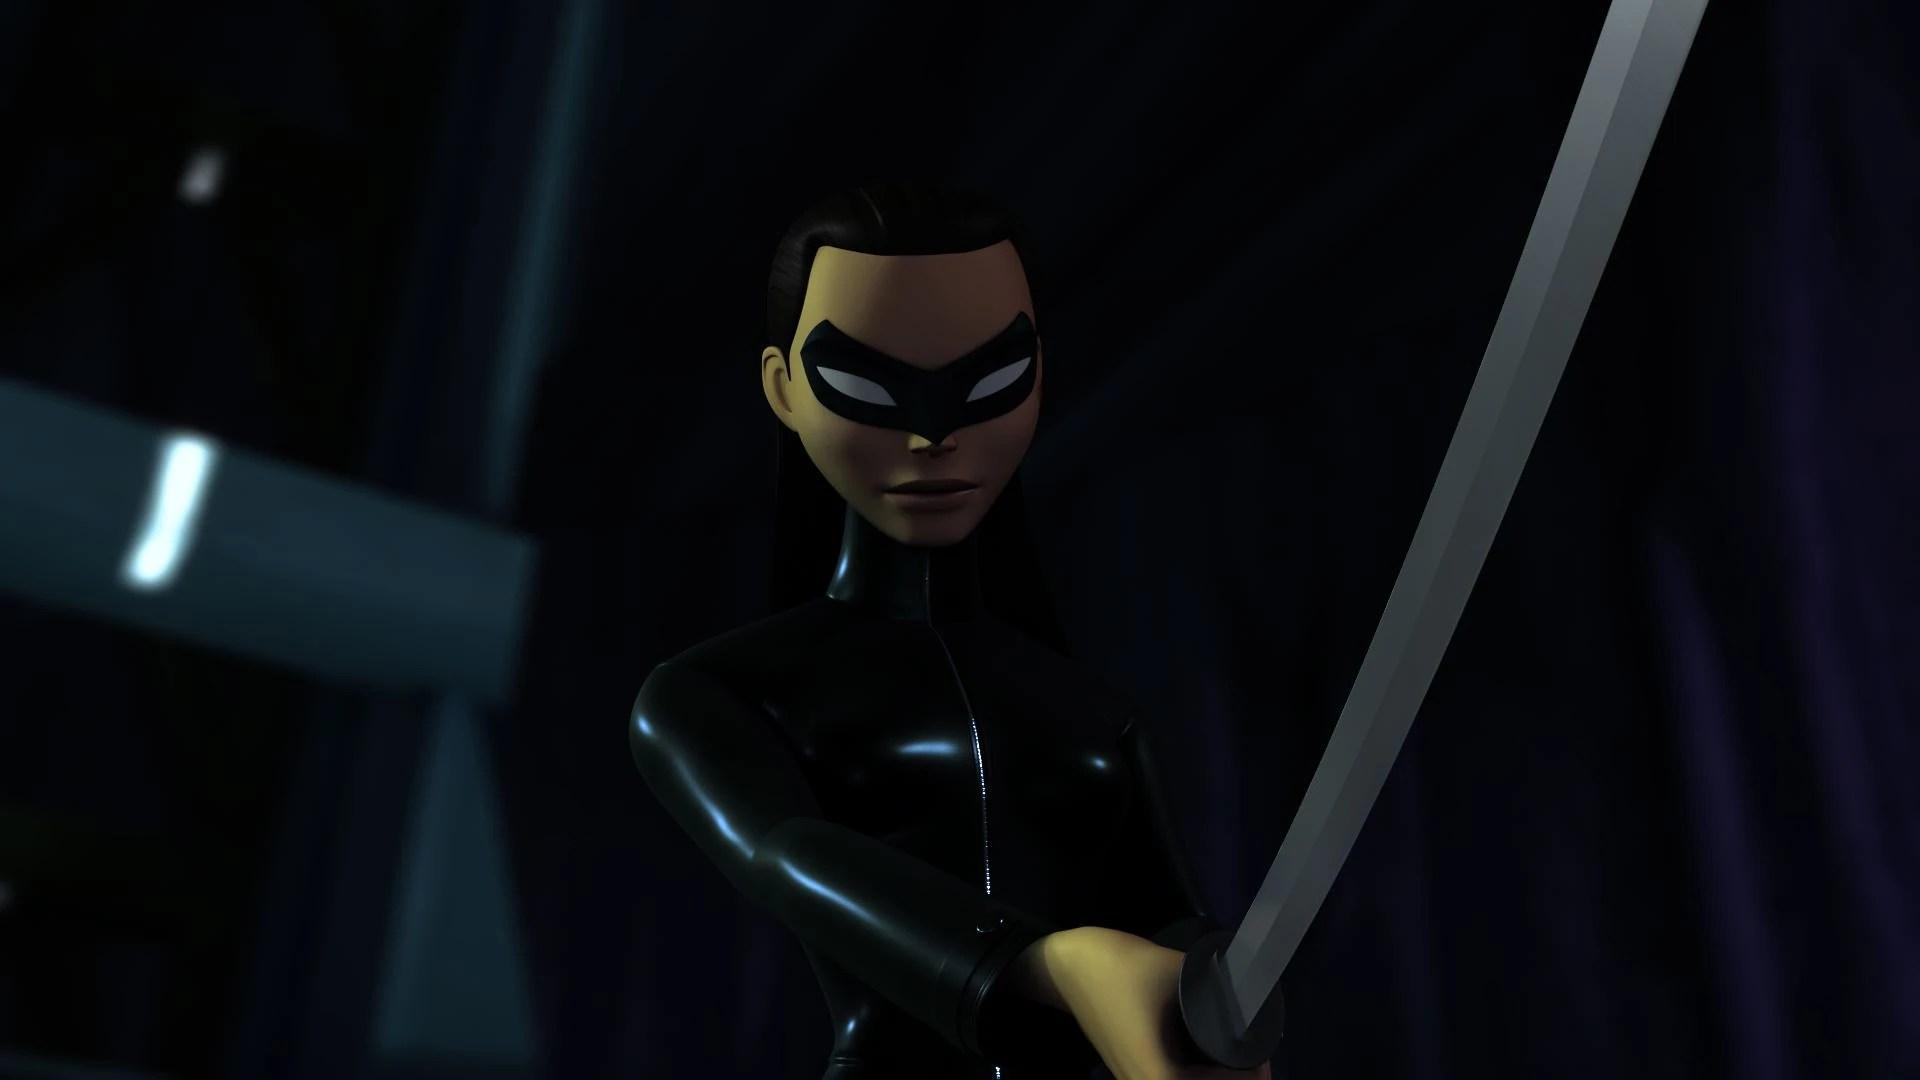 Sword Art Online Animated Wallpaper Katana Beware The Batman Batman Wiki Fandom Powered